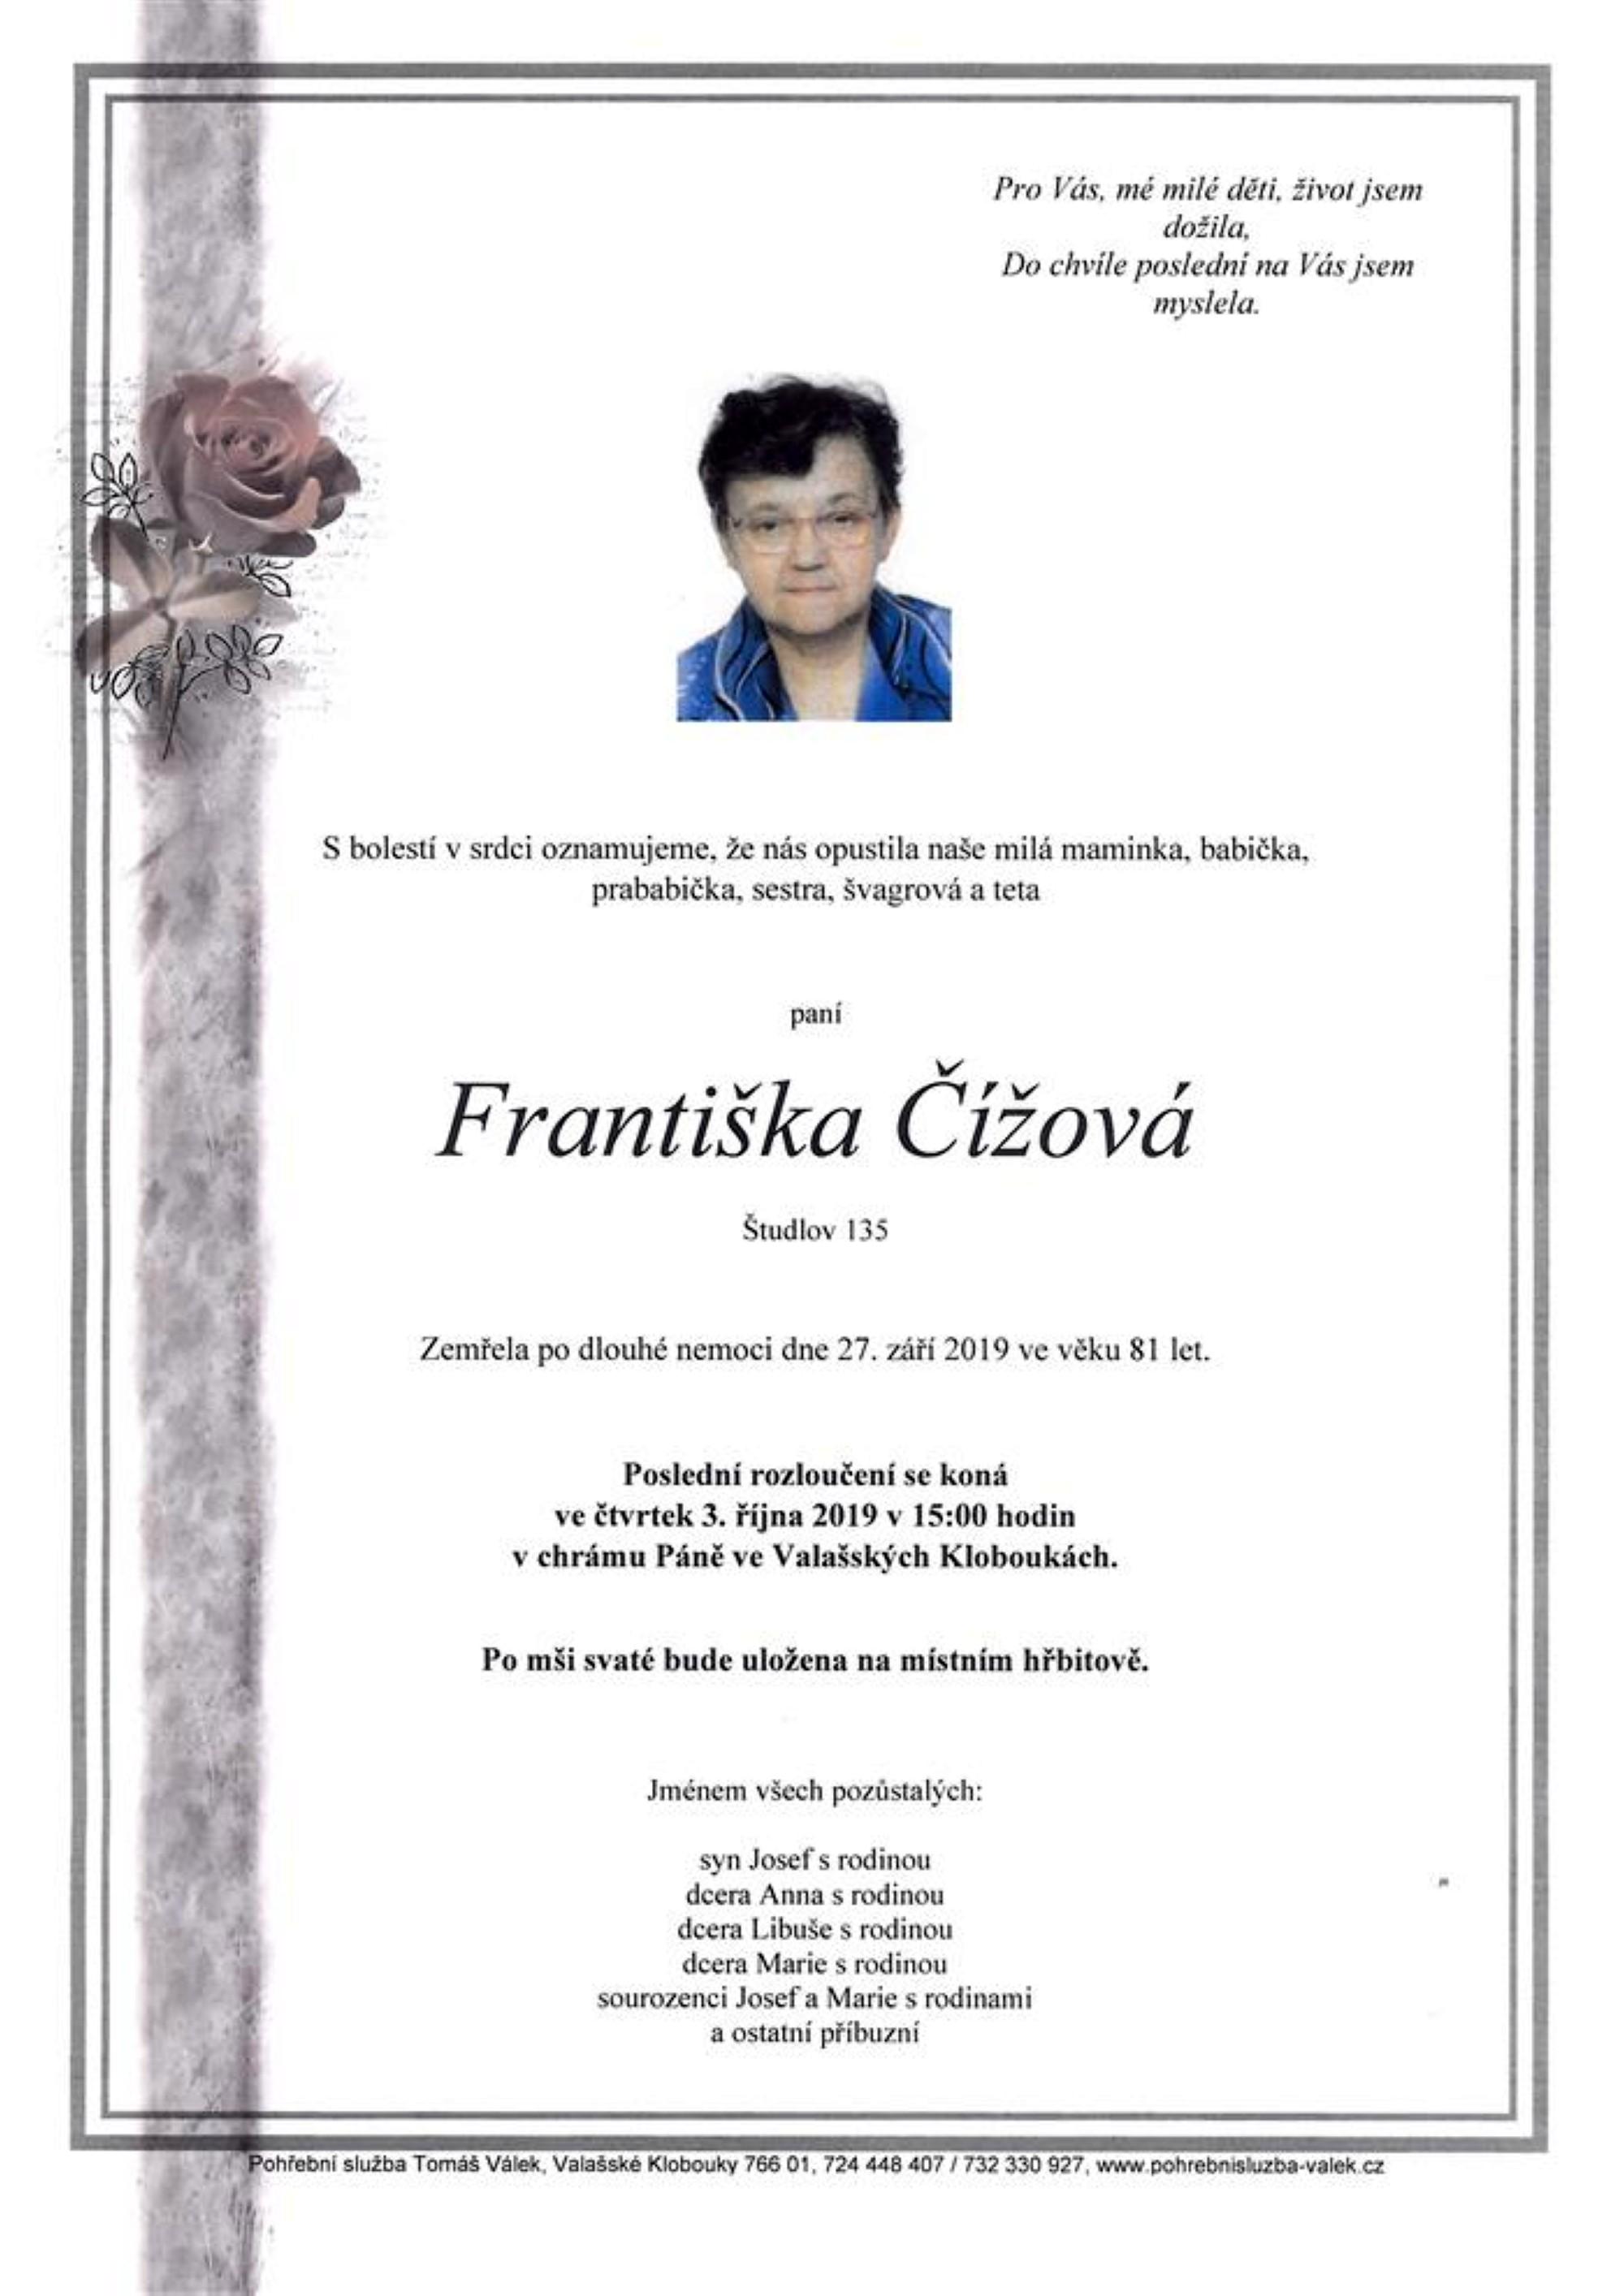 Františka Čížová